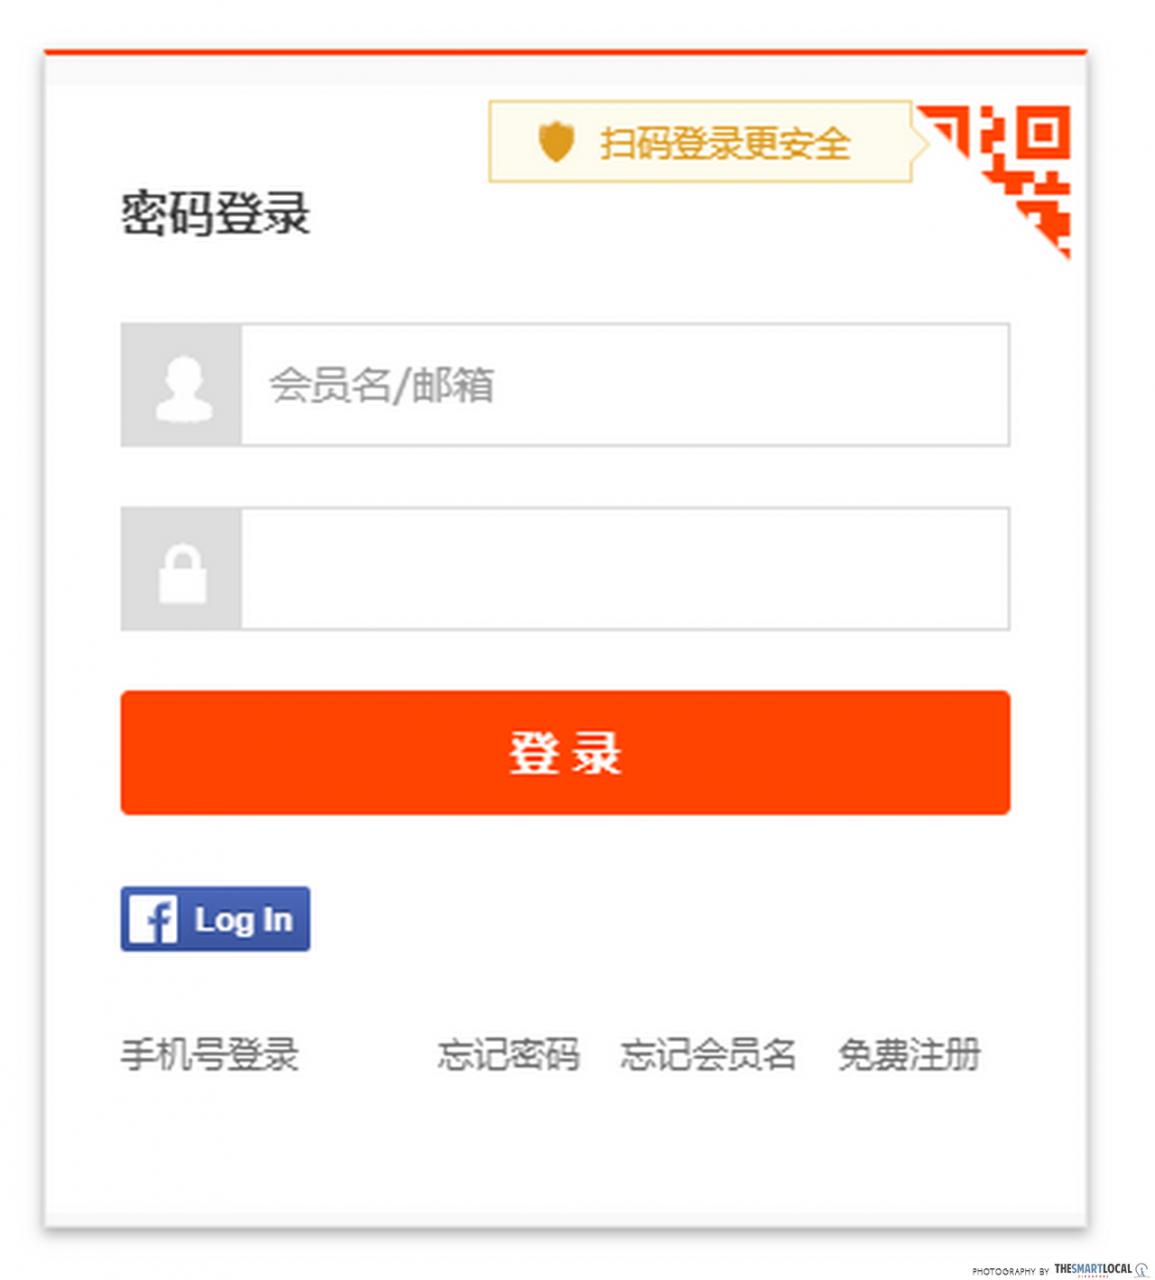 logging in on taobao